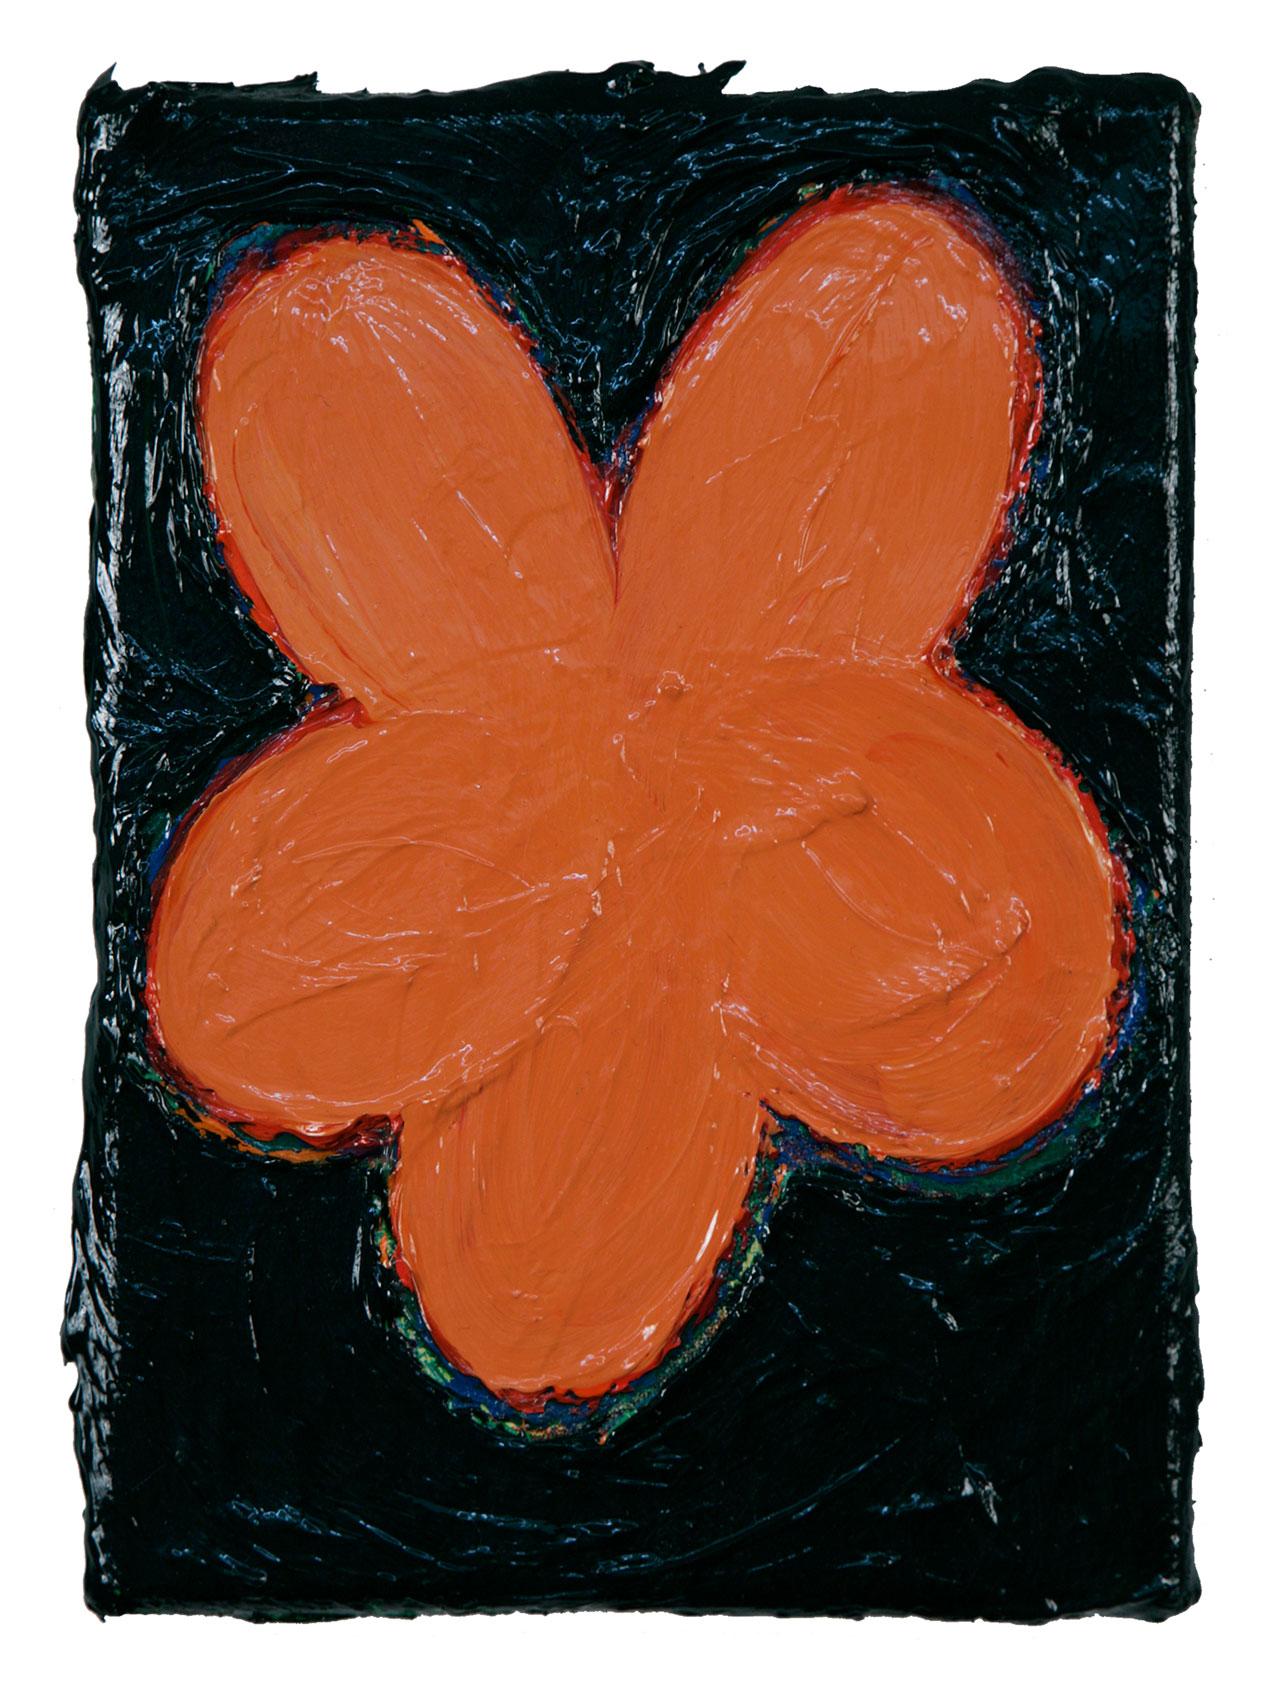 25 Flowers 11 | 2008 © Kerstin Jeckel | MEMORY-PROJEKT # extra